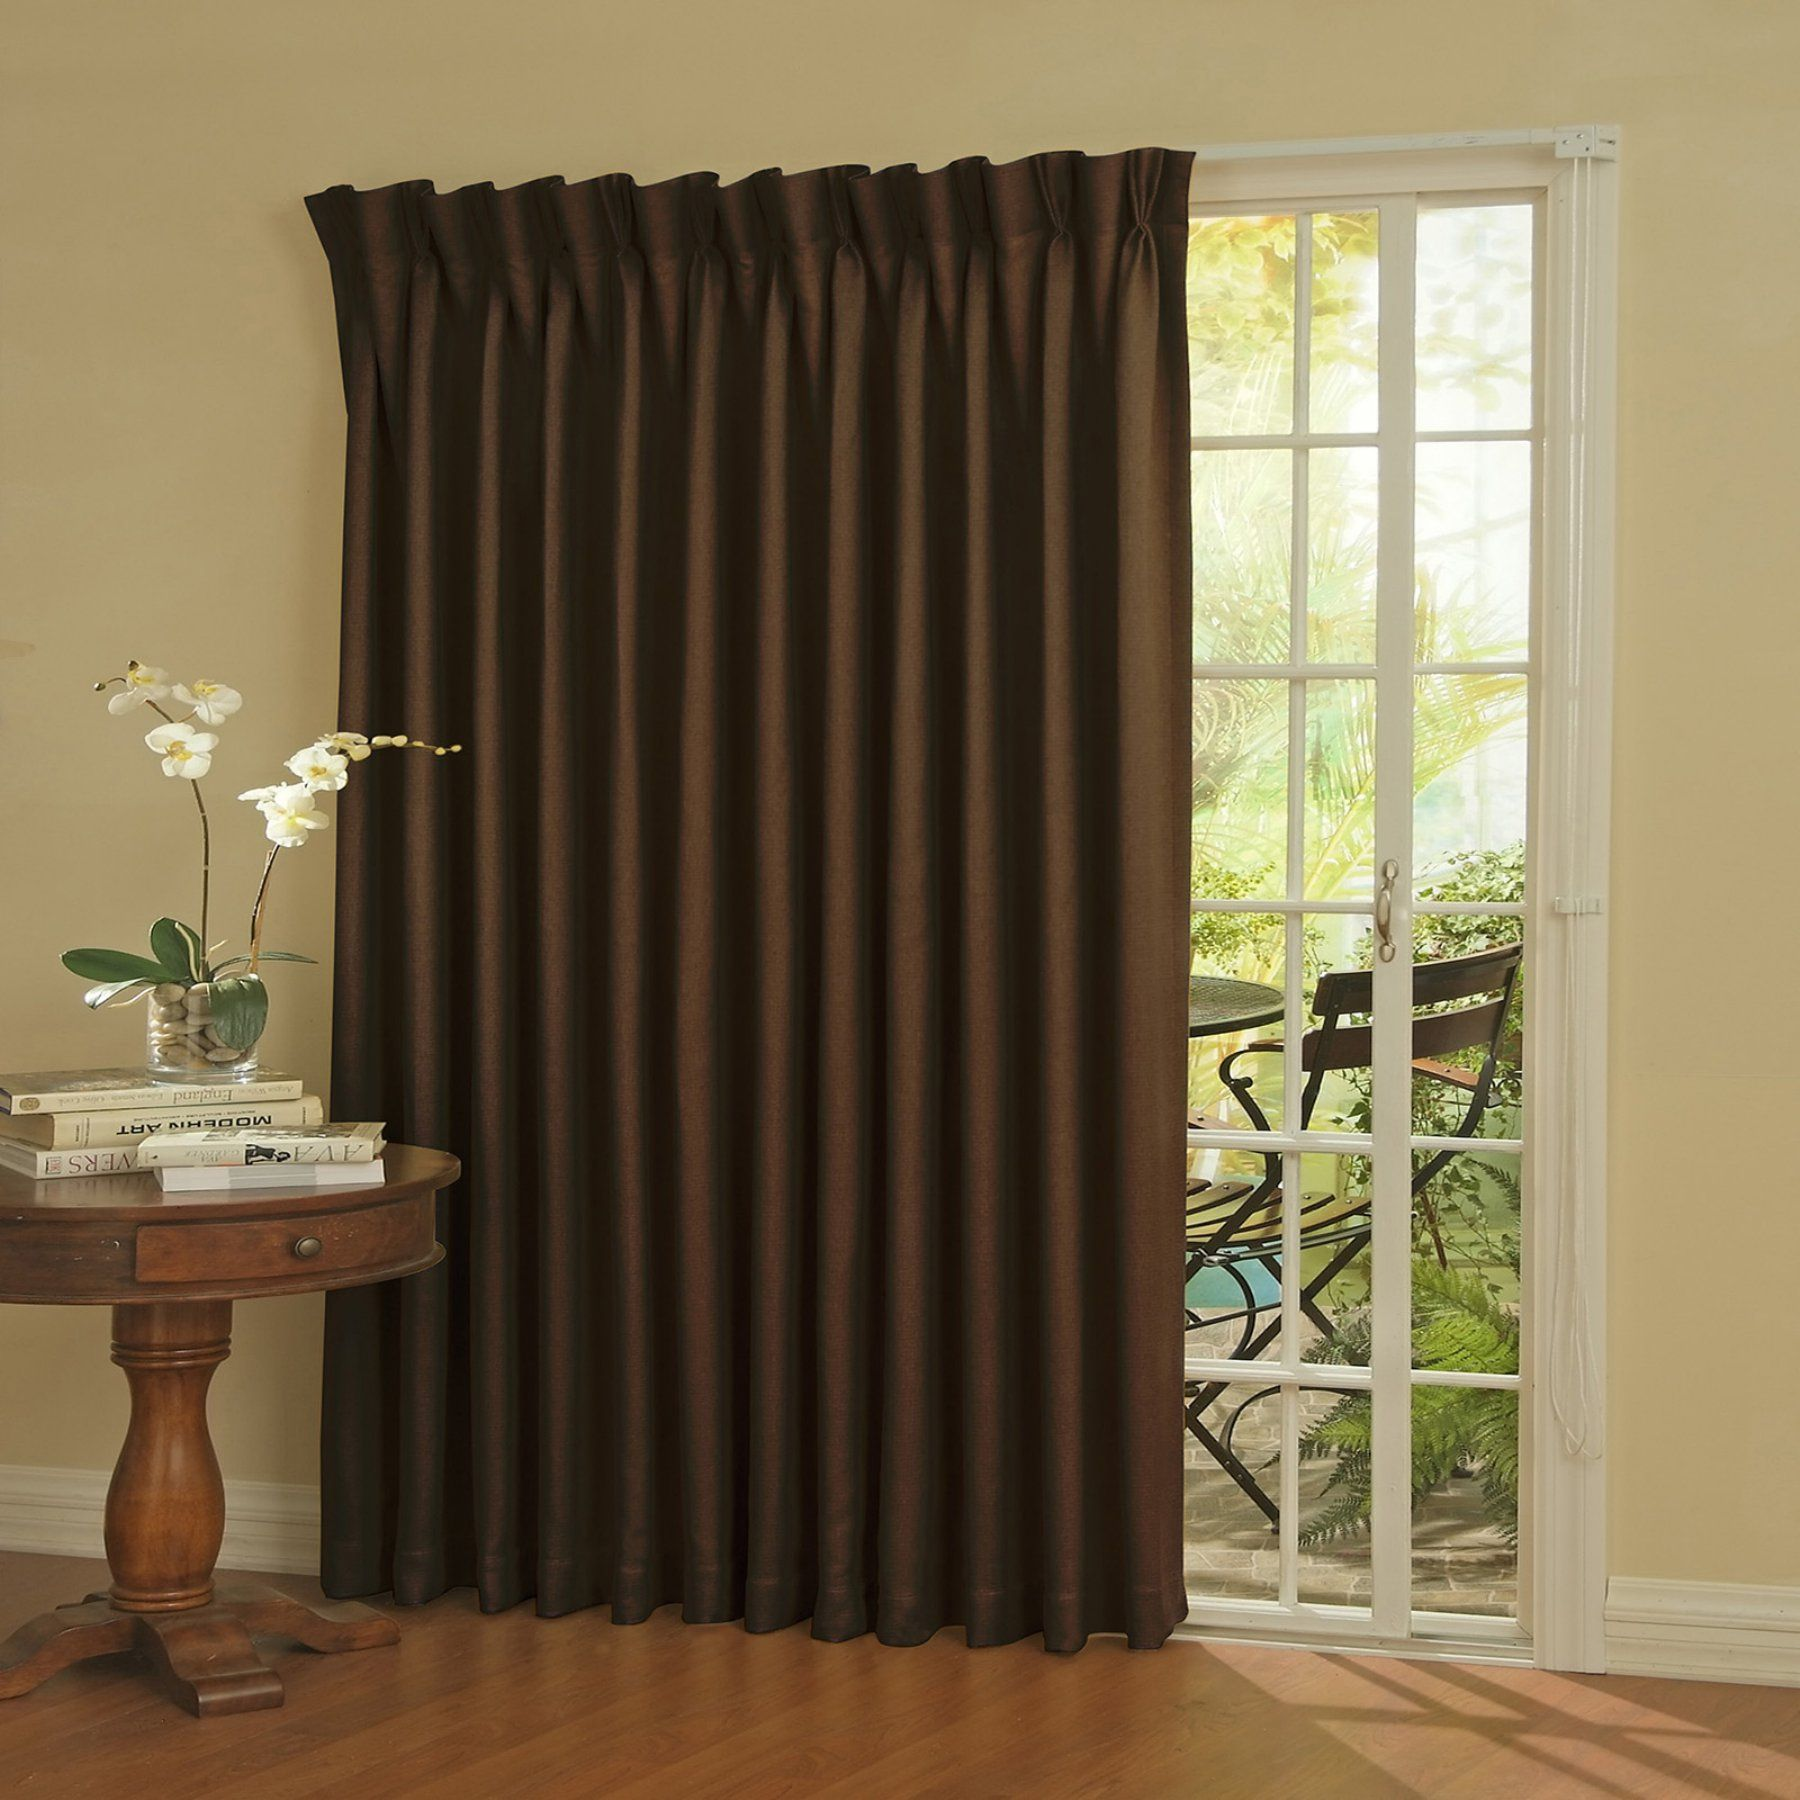 Eclipse Thermal Blackout Patio Door Curtain Panel 12109100x084esp